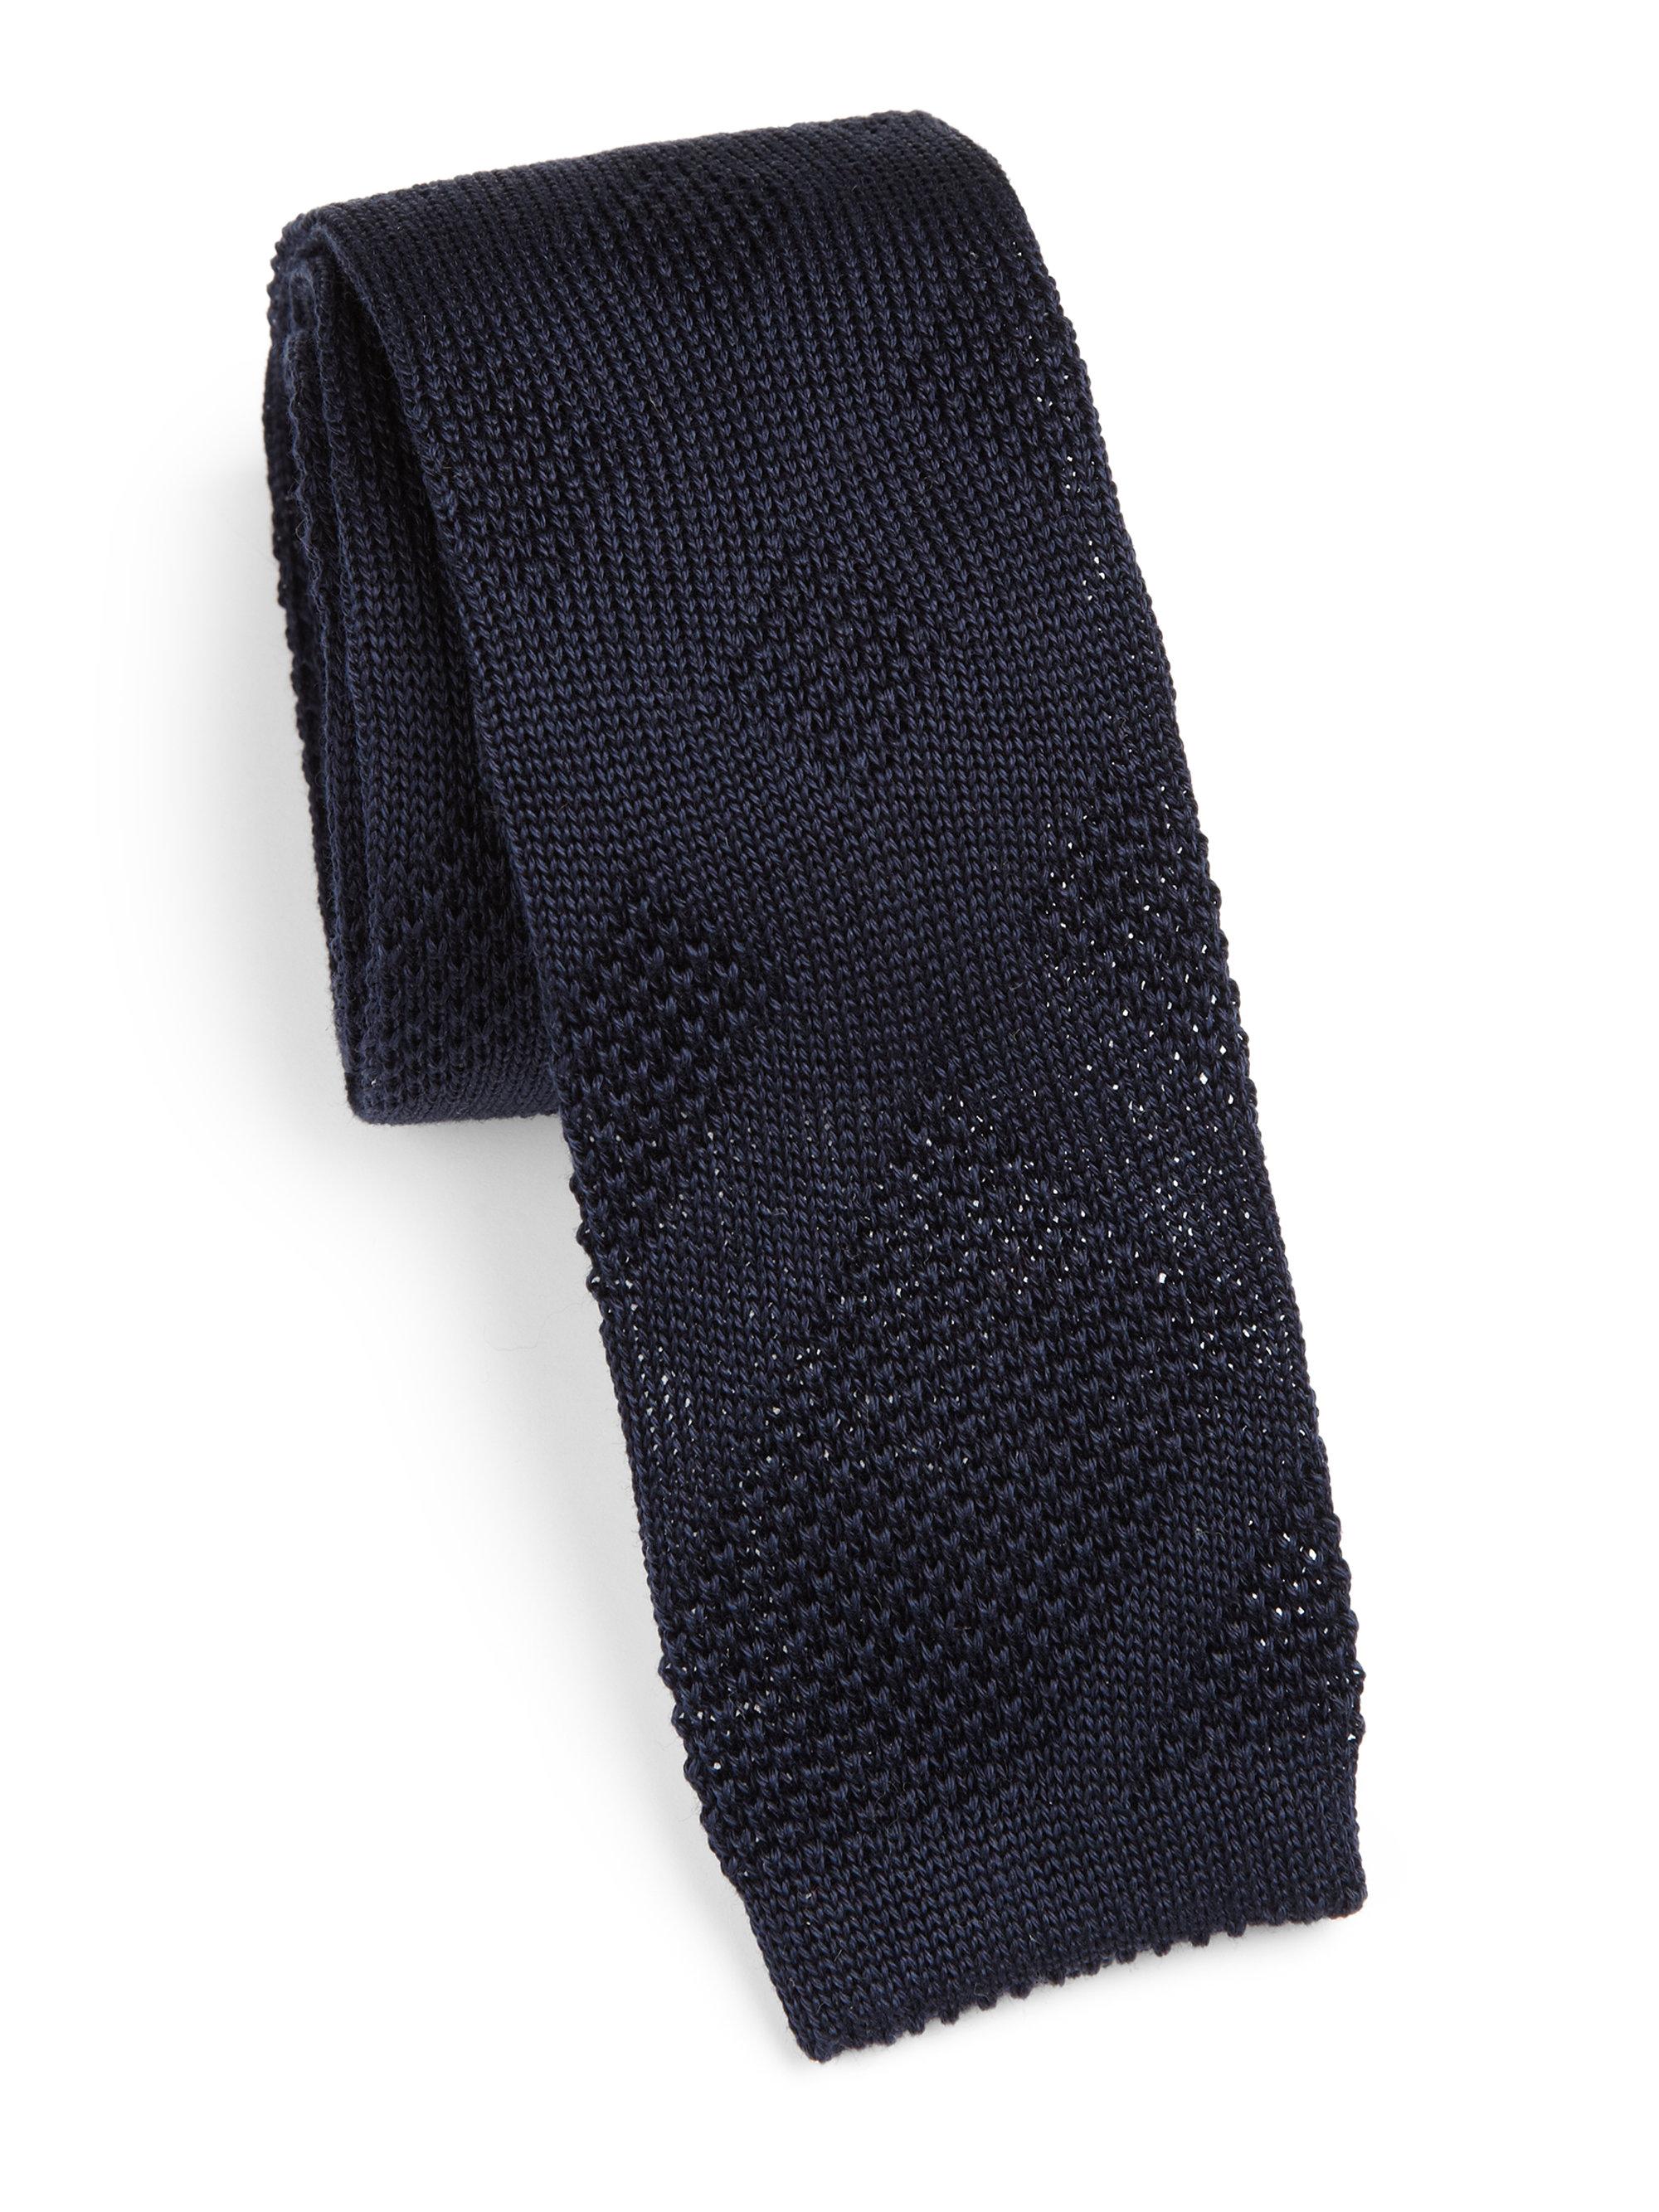 07448854c2c7 Burberry Kenneth Silk Knit Tie in Blue for Men - Lyst